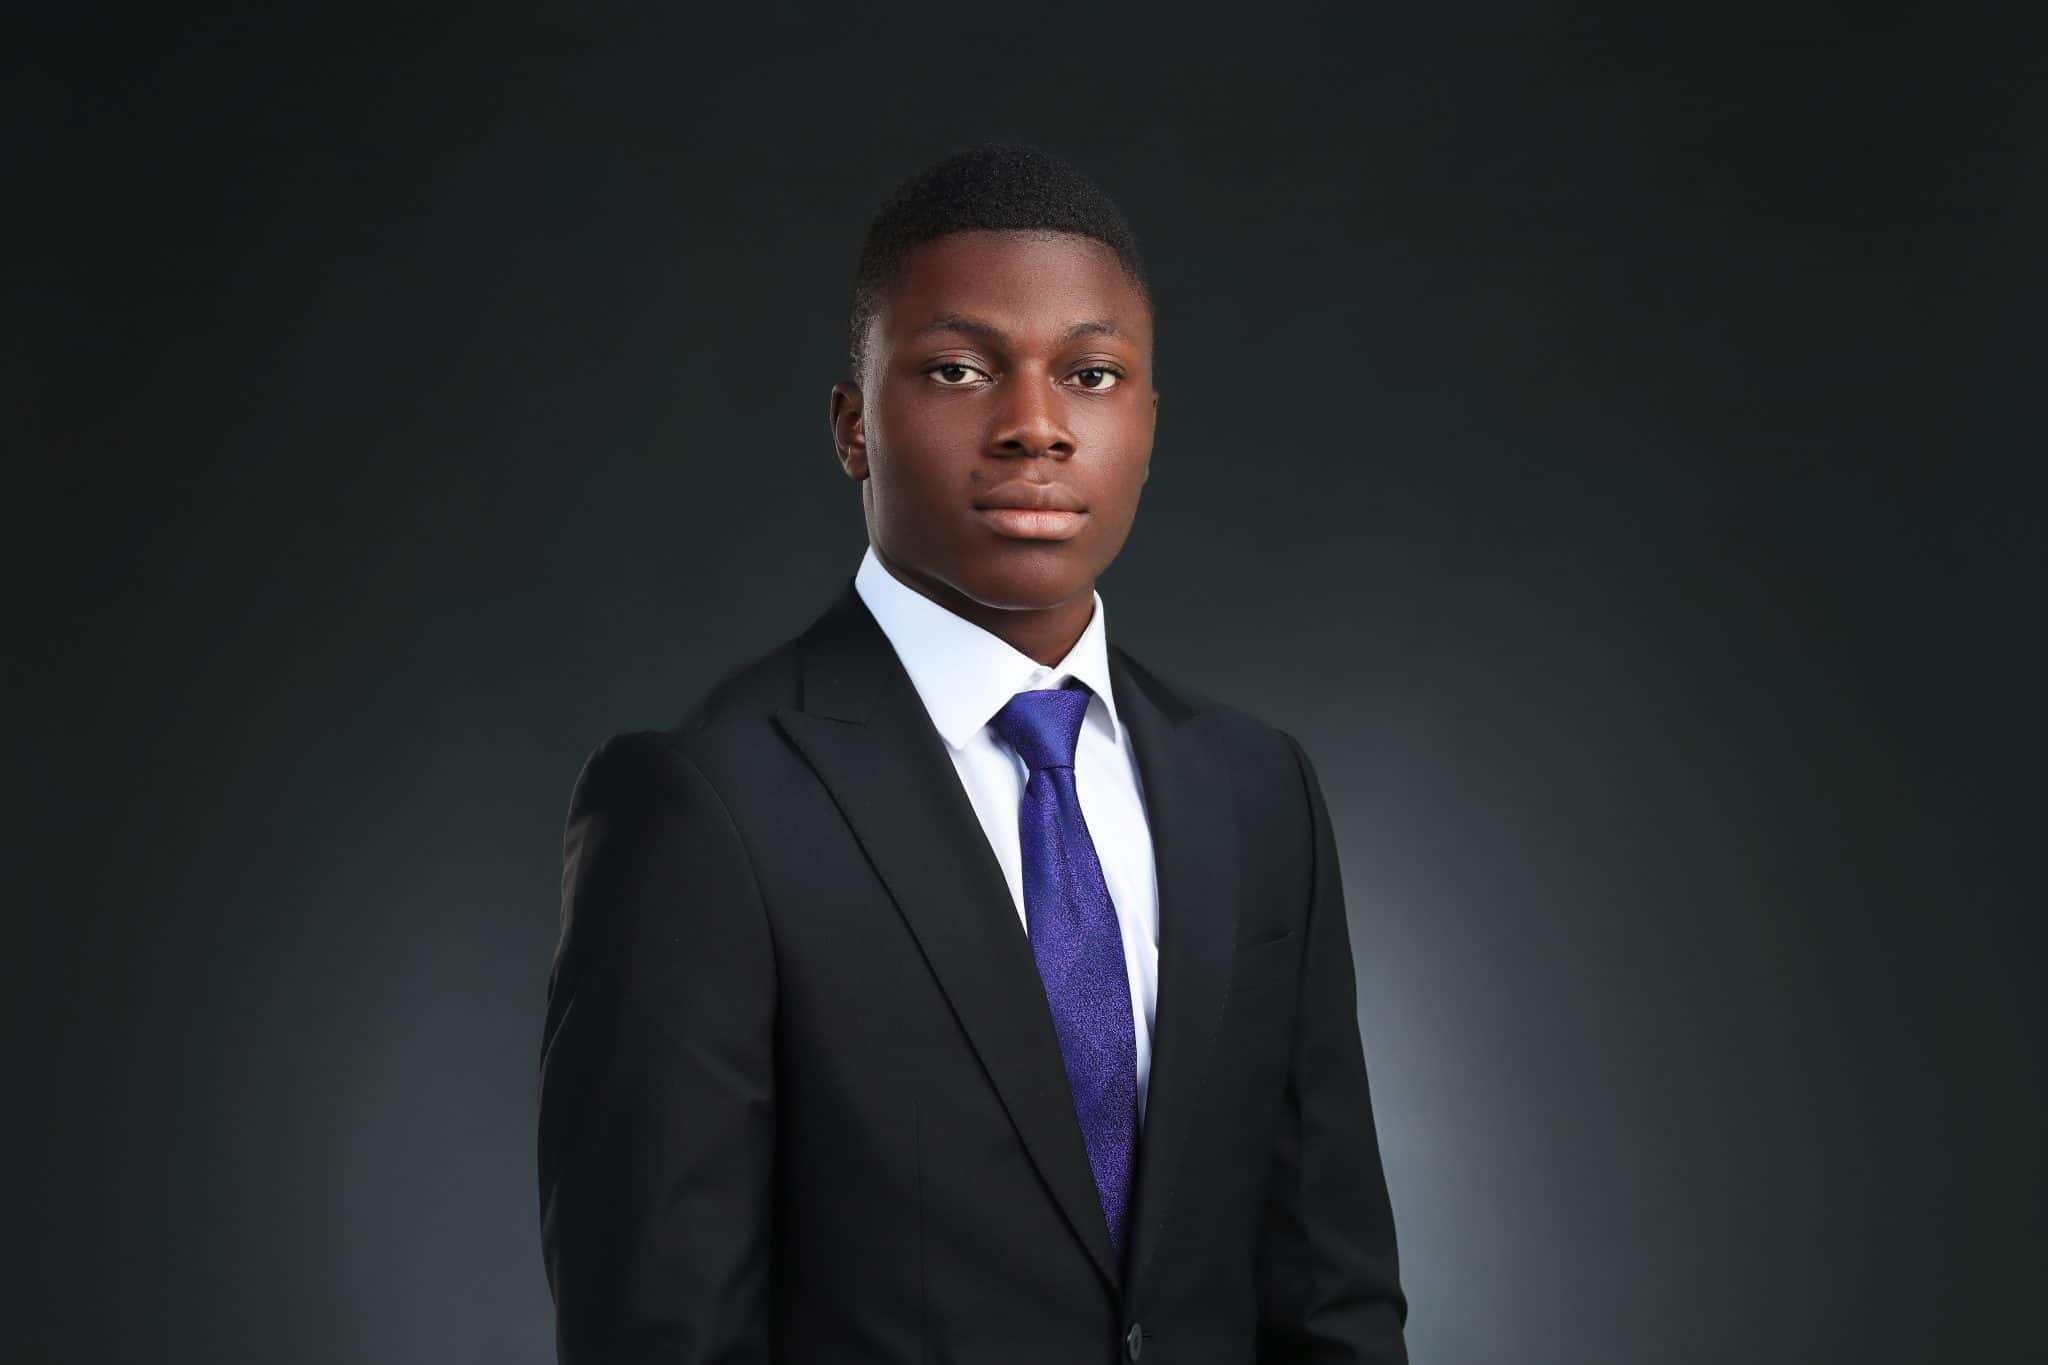 Junior Natabou jeune entrepreneur  scaled